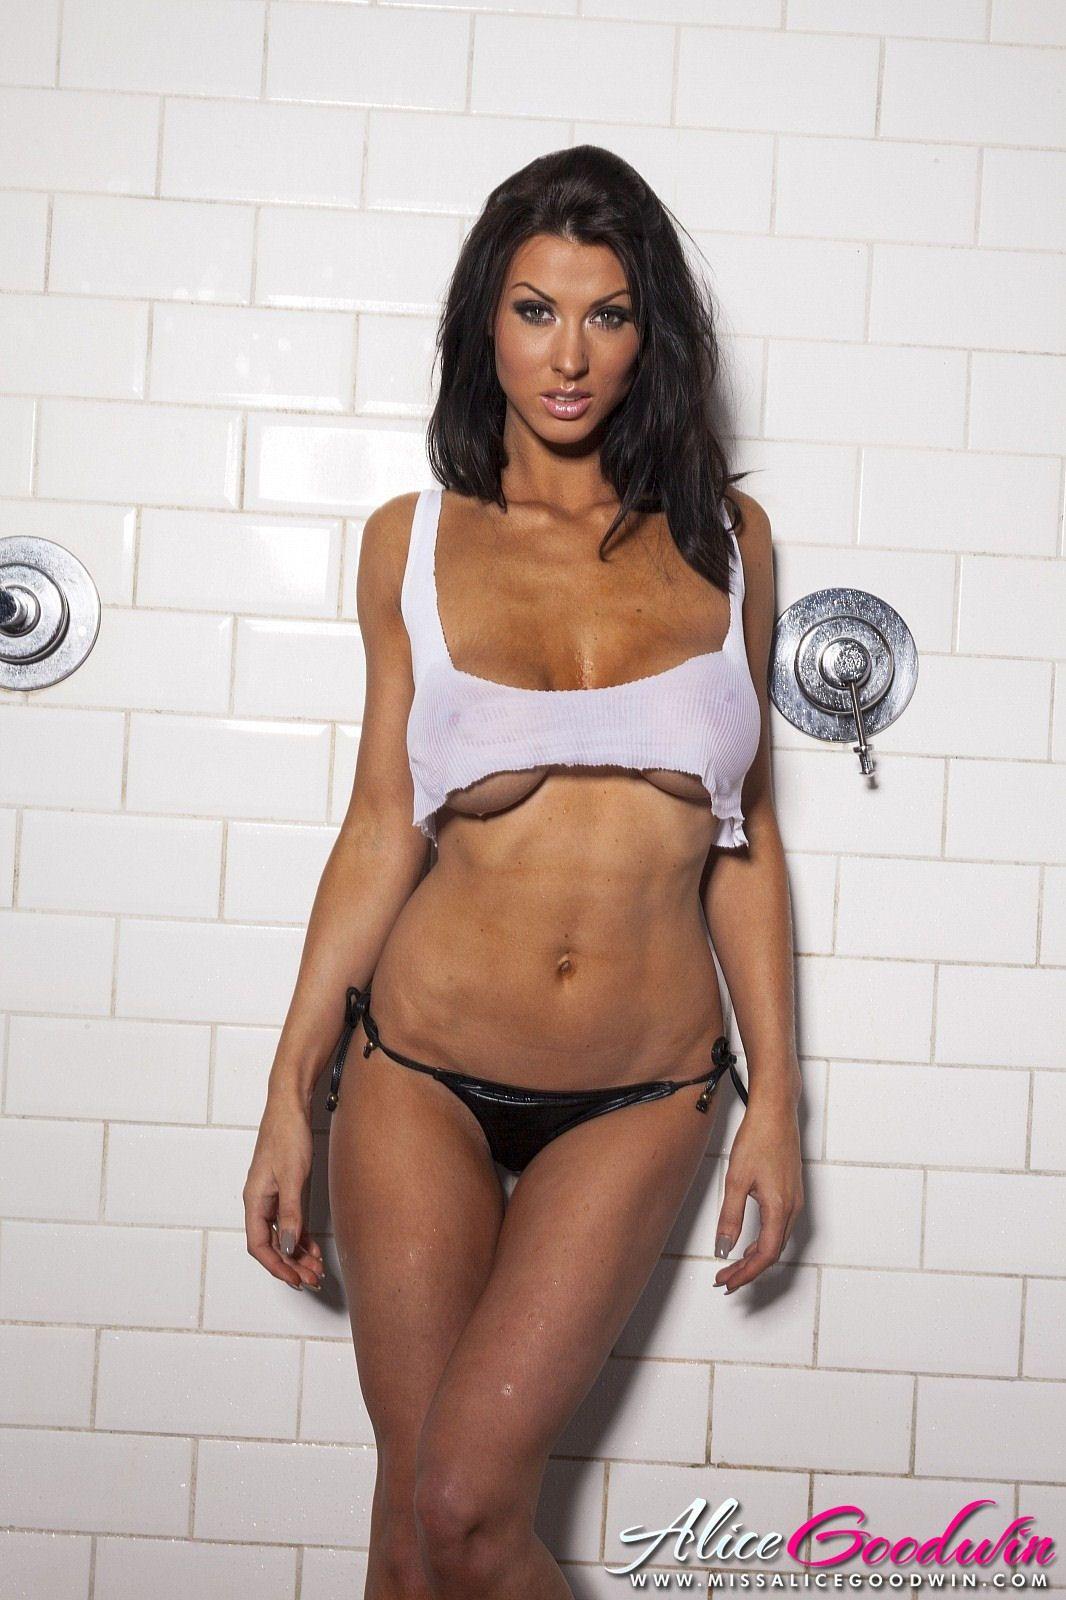 Alice Goodwin Shower